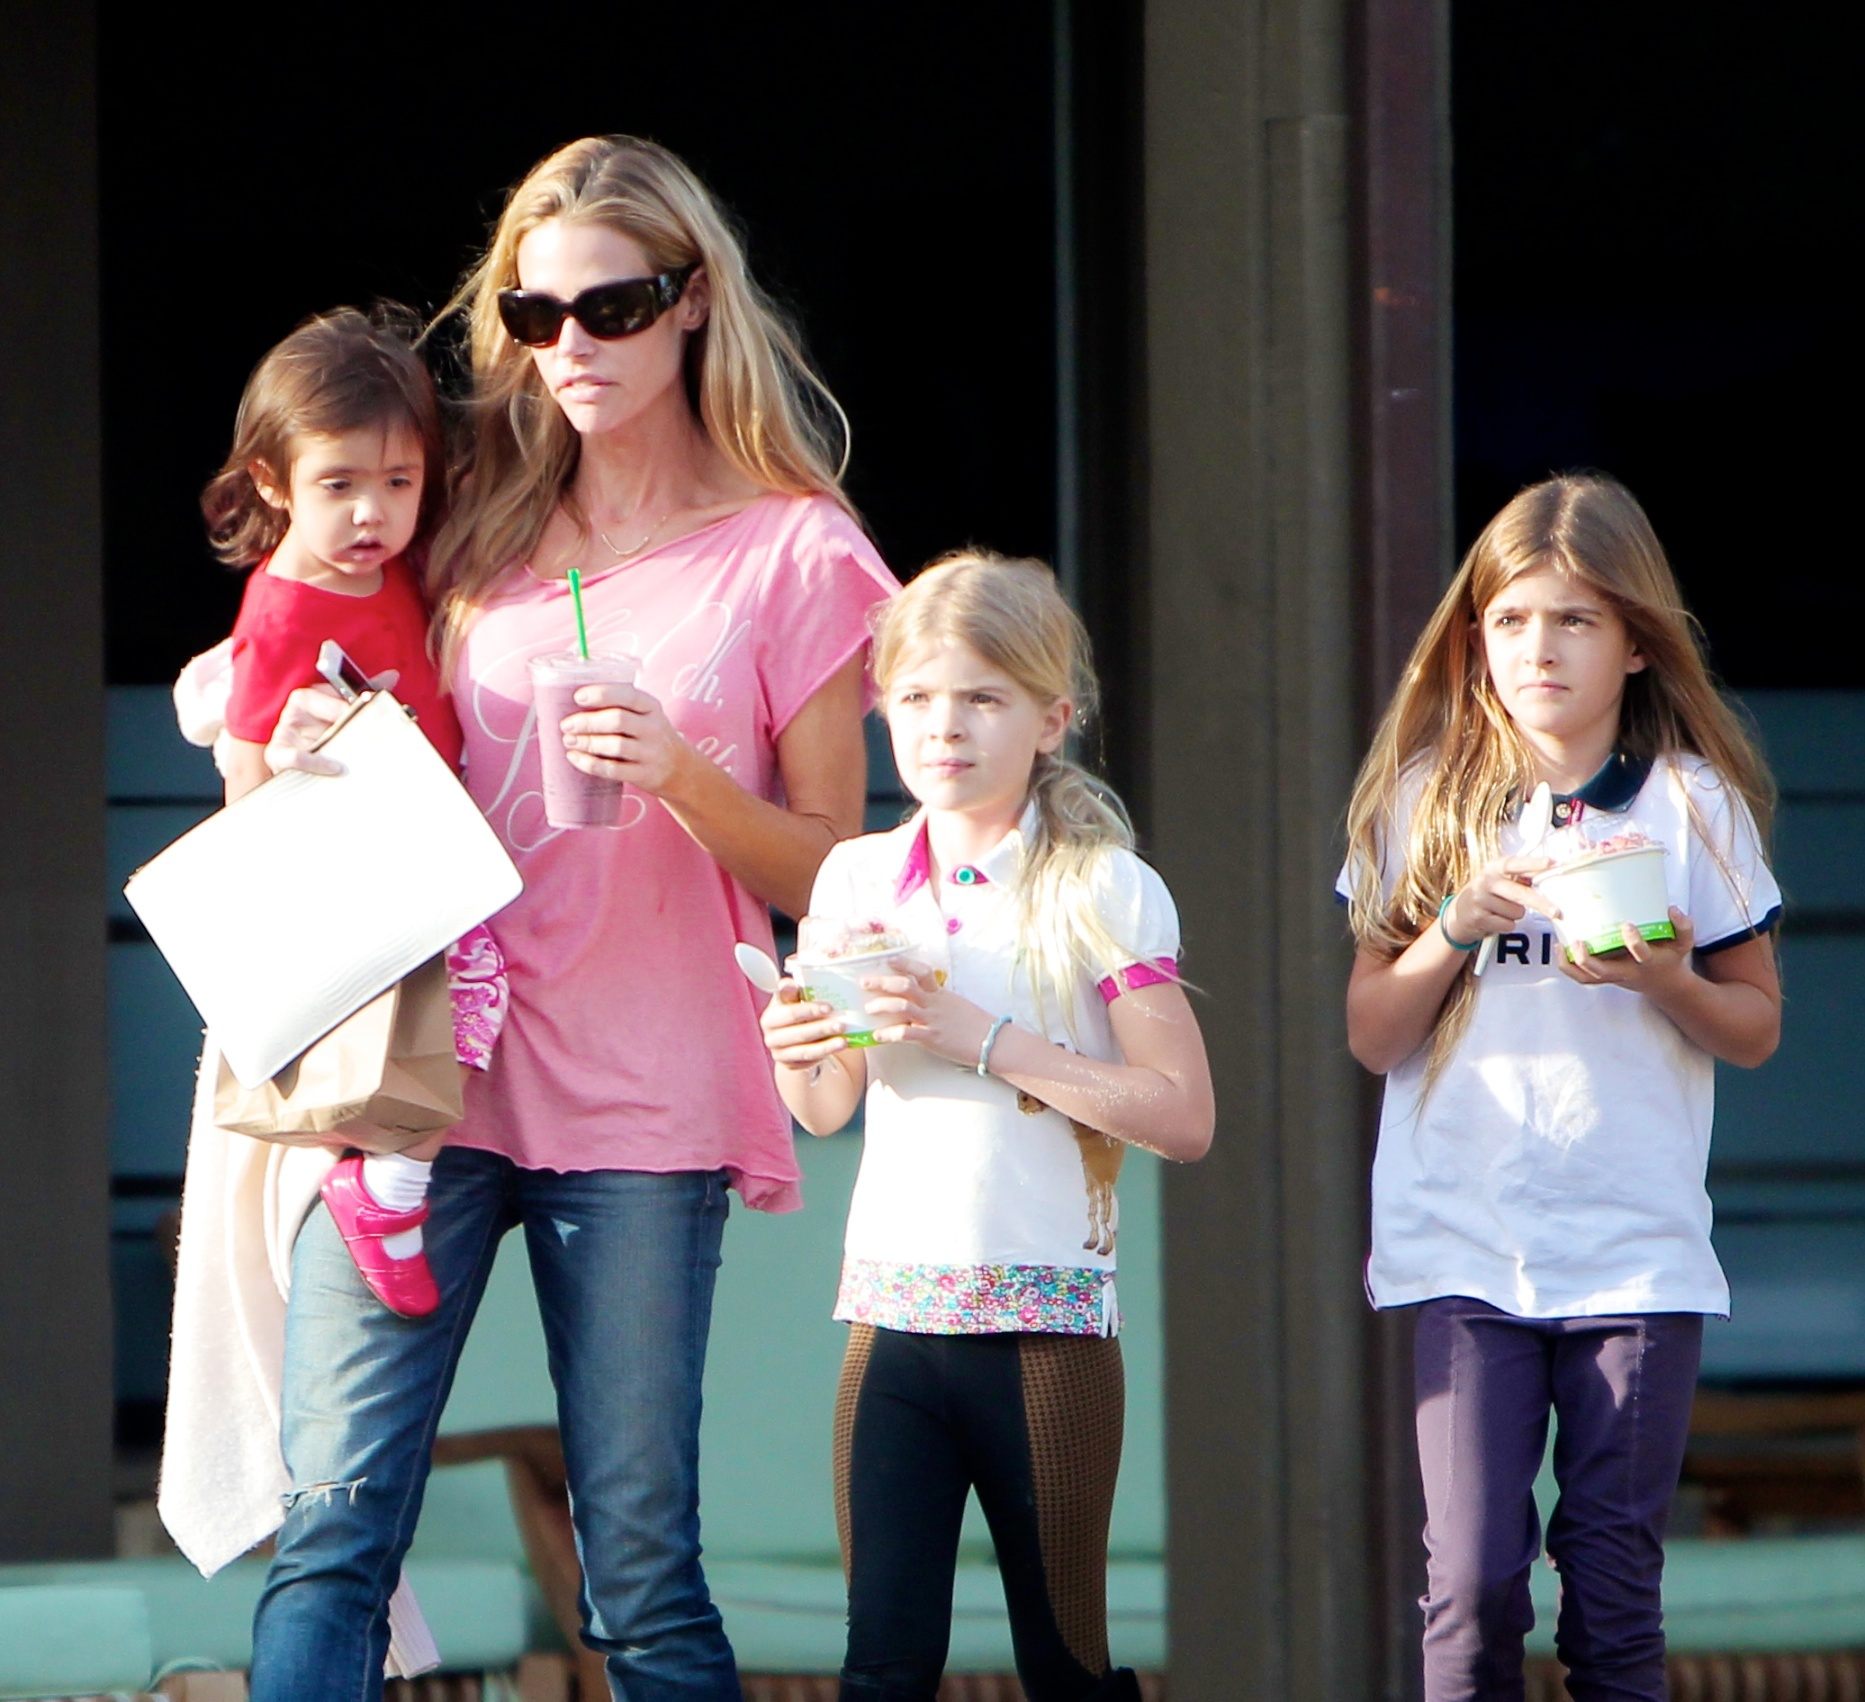 denise richards charlie sheen's twins custody brooke mueller violence